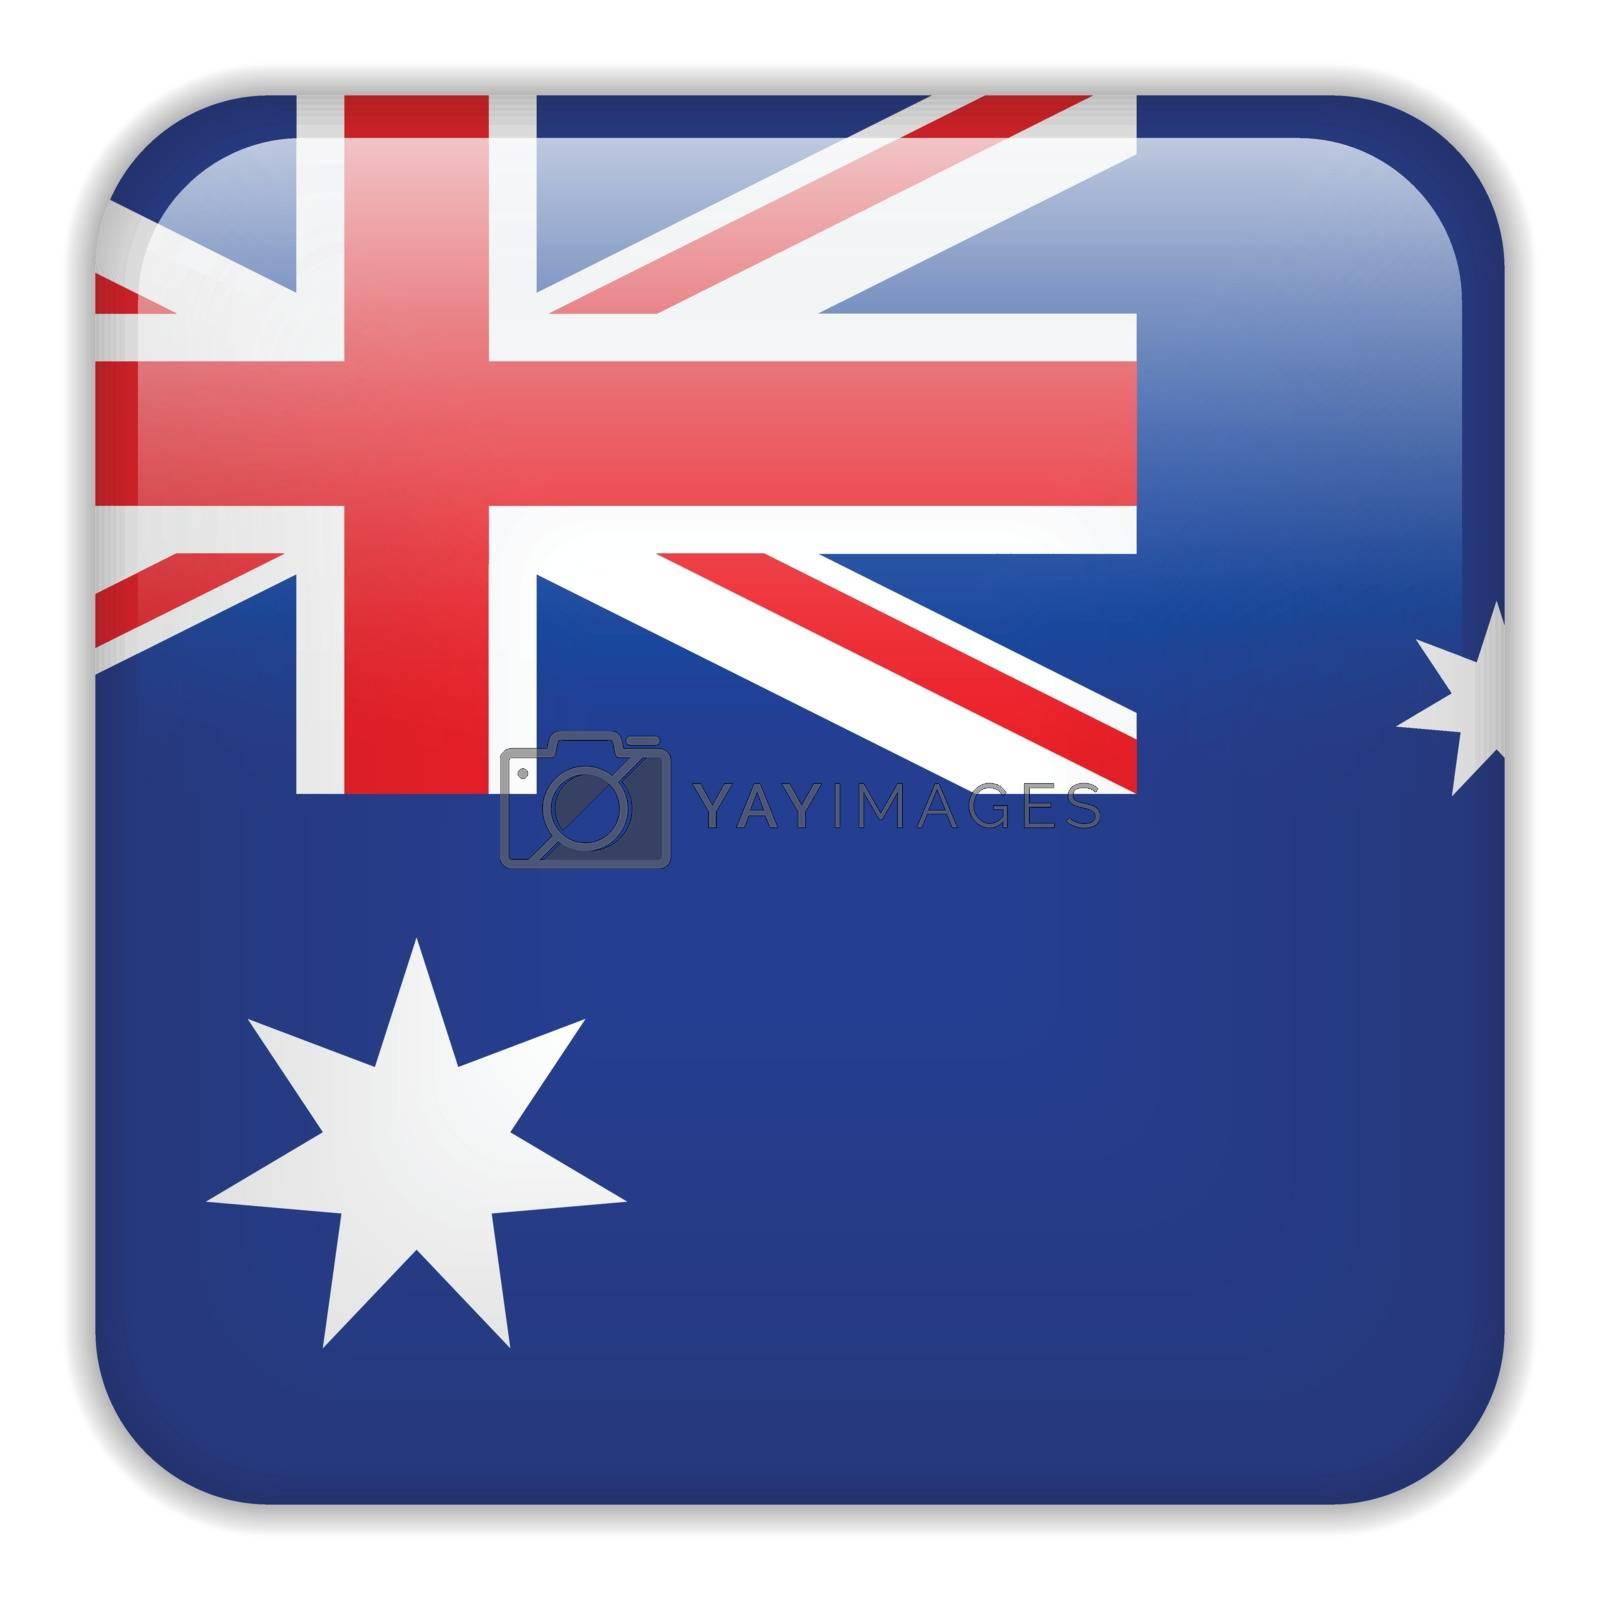 Vector - Australia Flag Smartphone Application Square Buttons